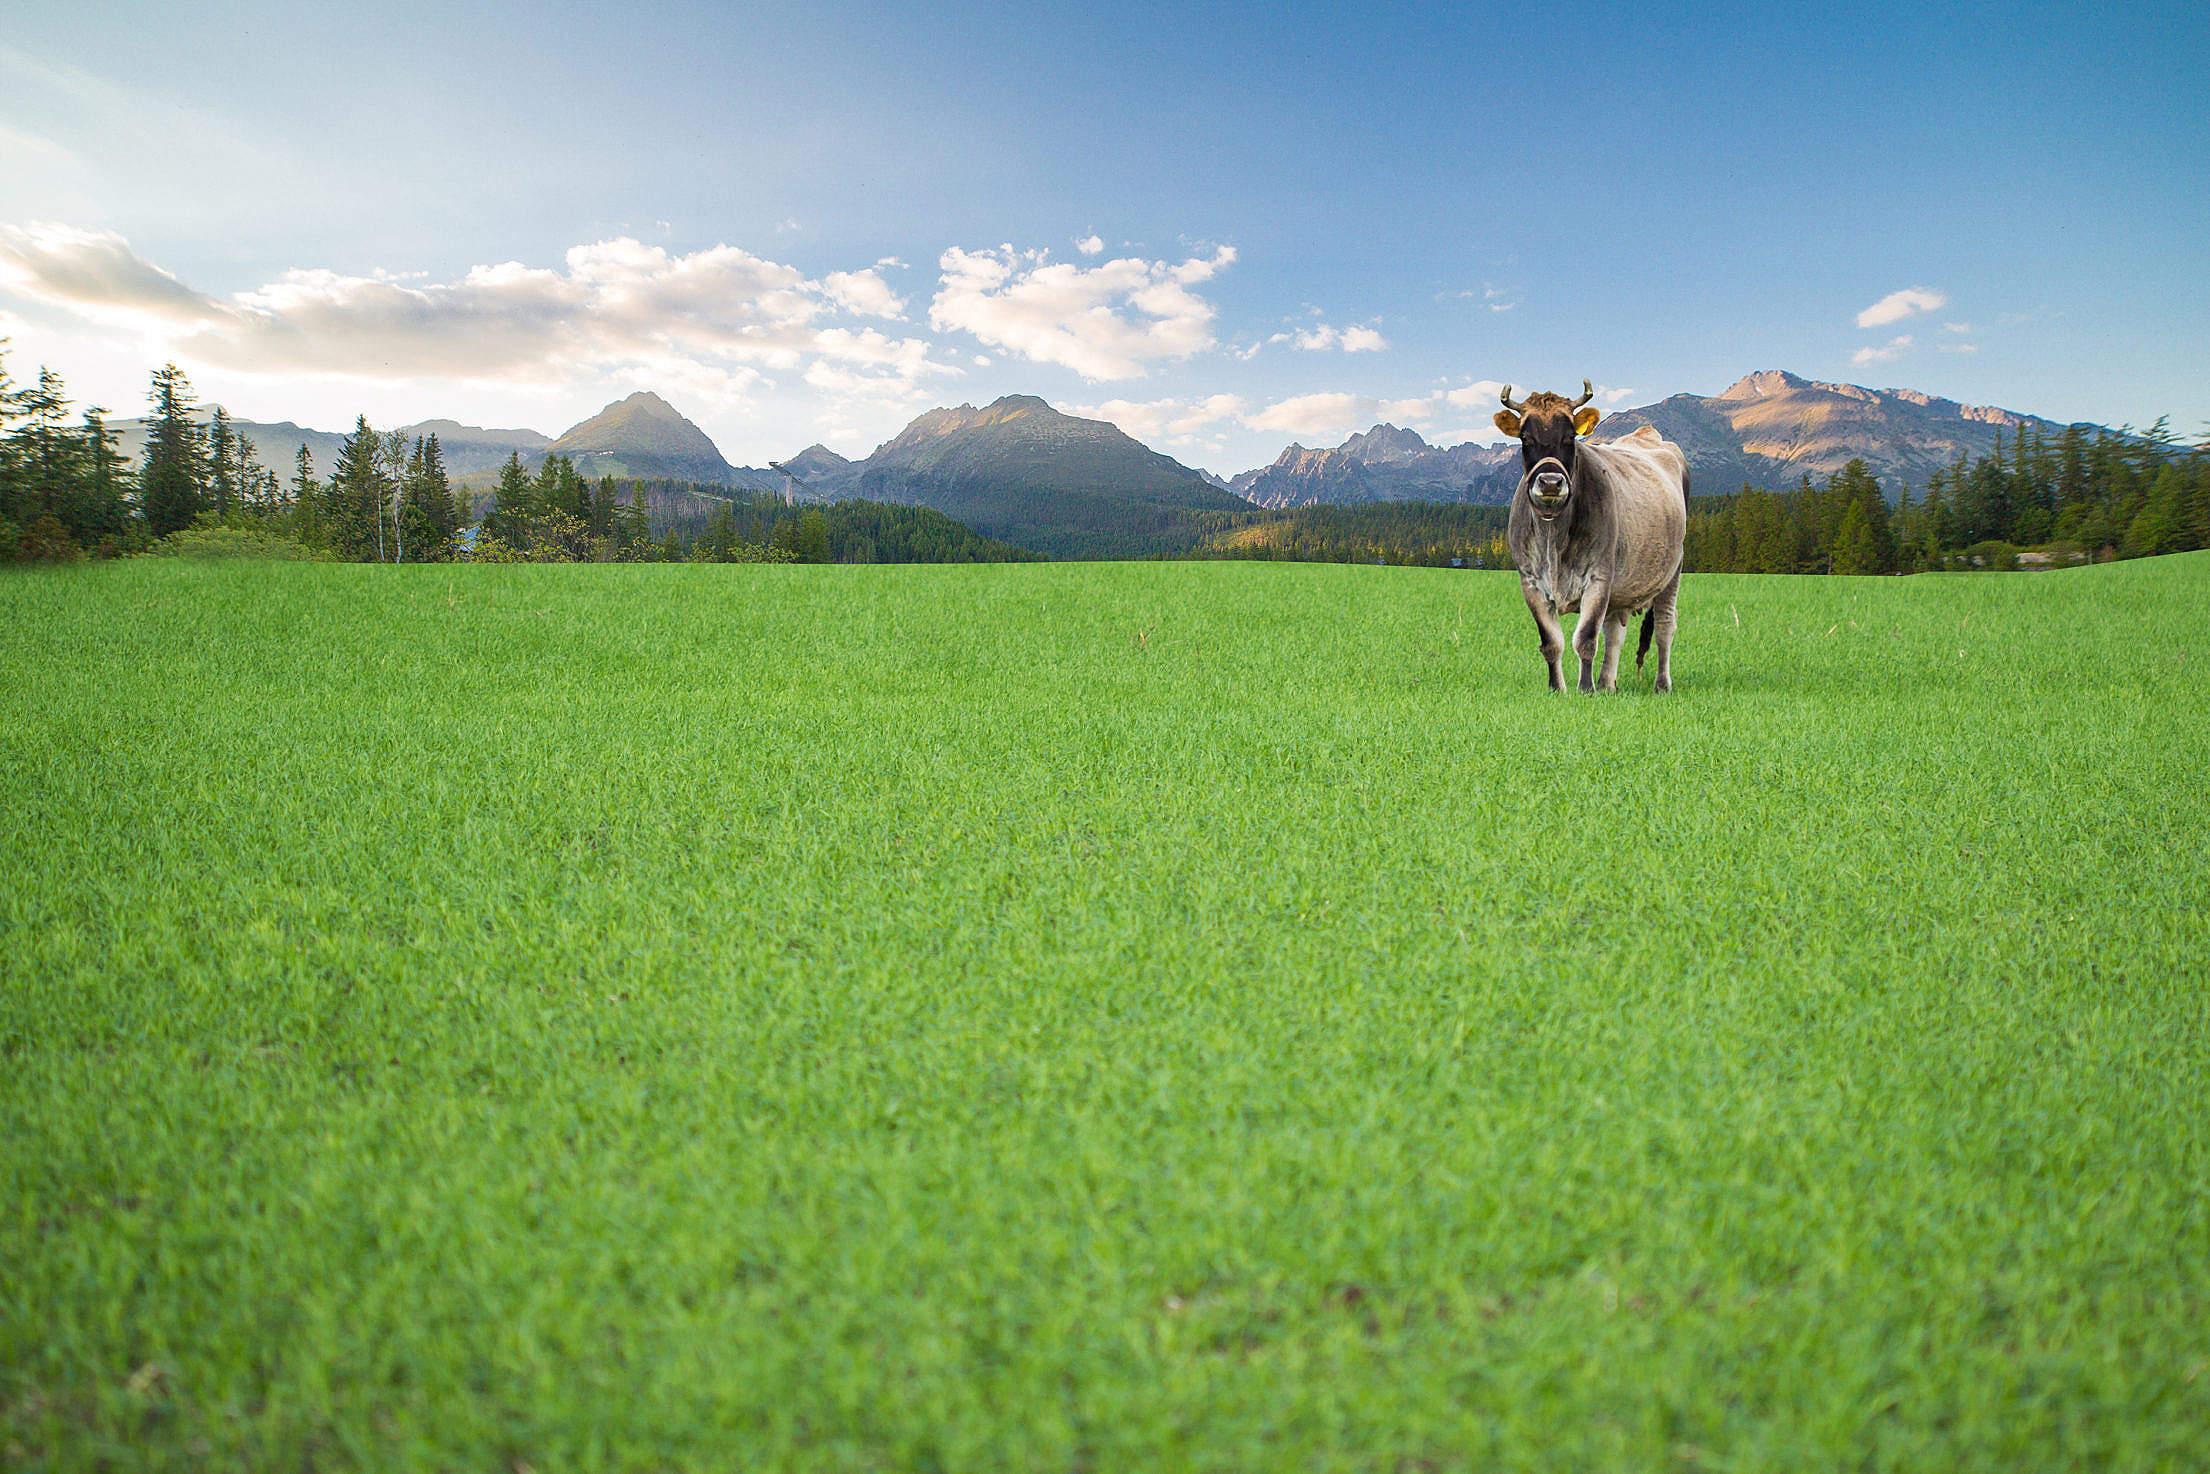 Happy Cow from Organic Farm Free Range Free Stock Photo